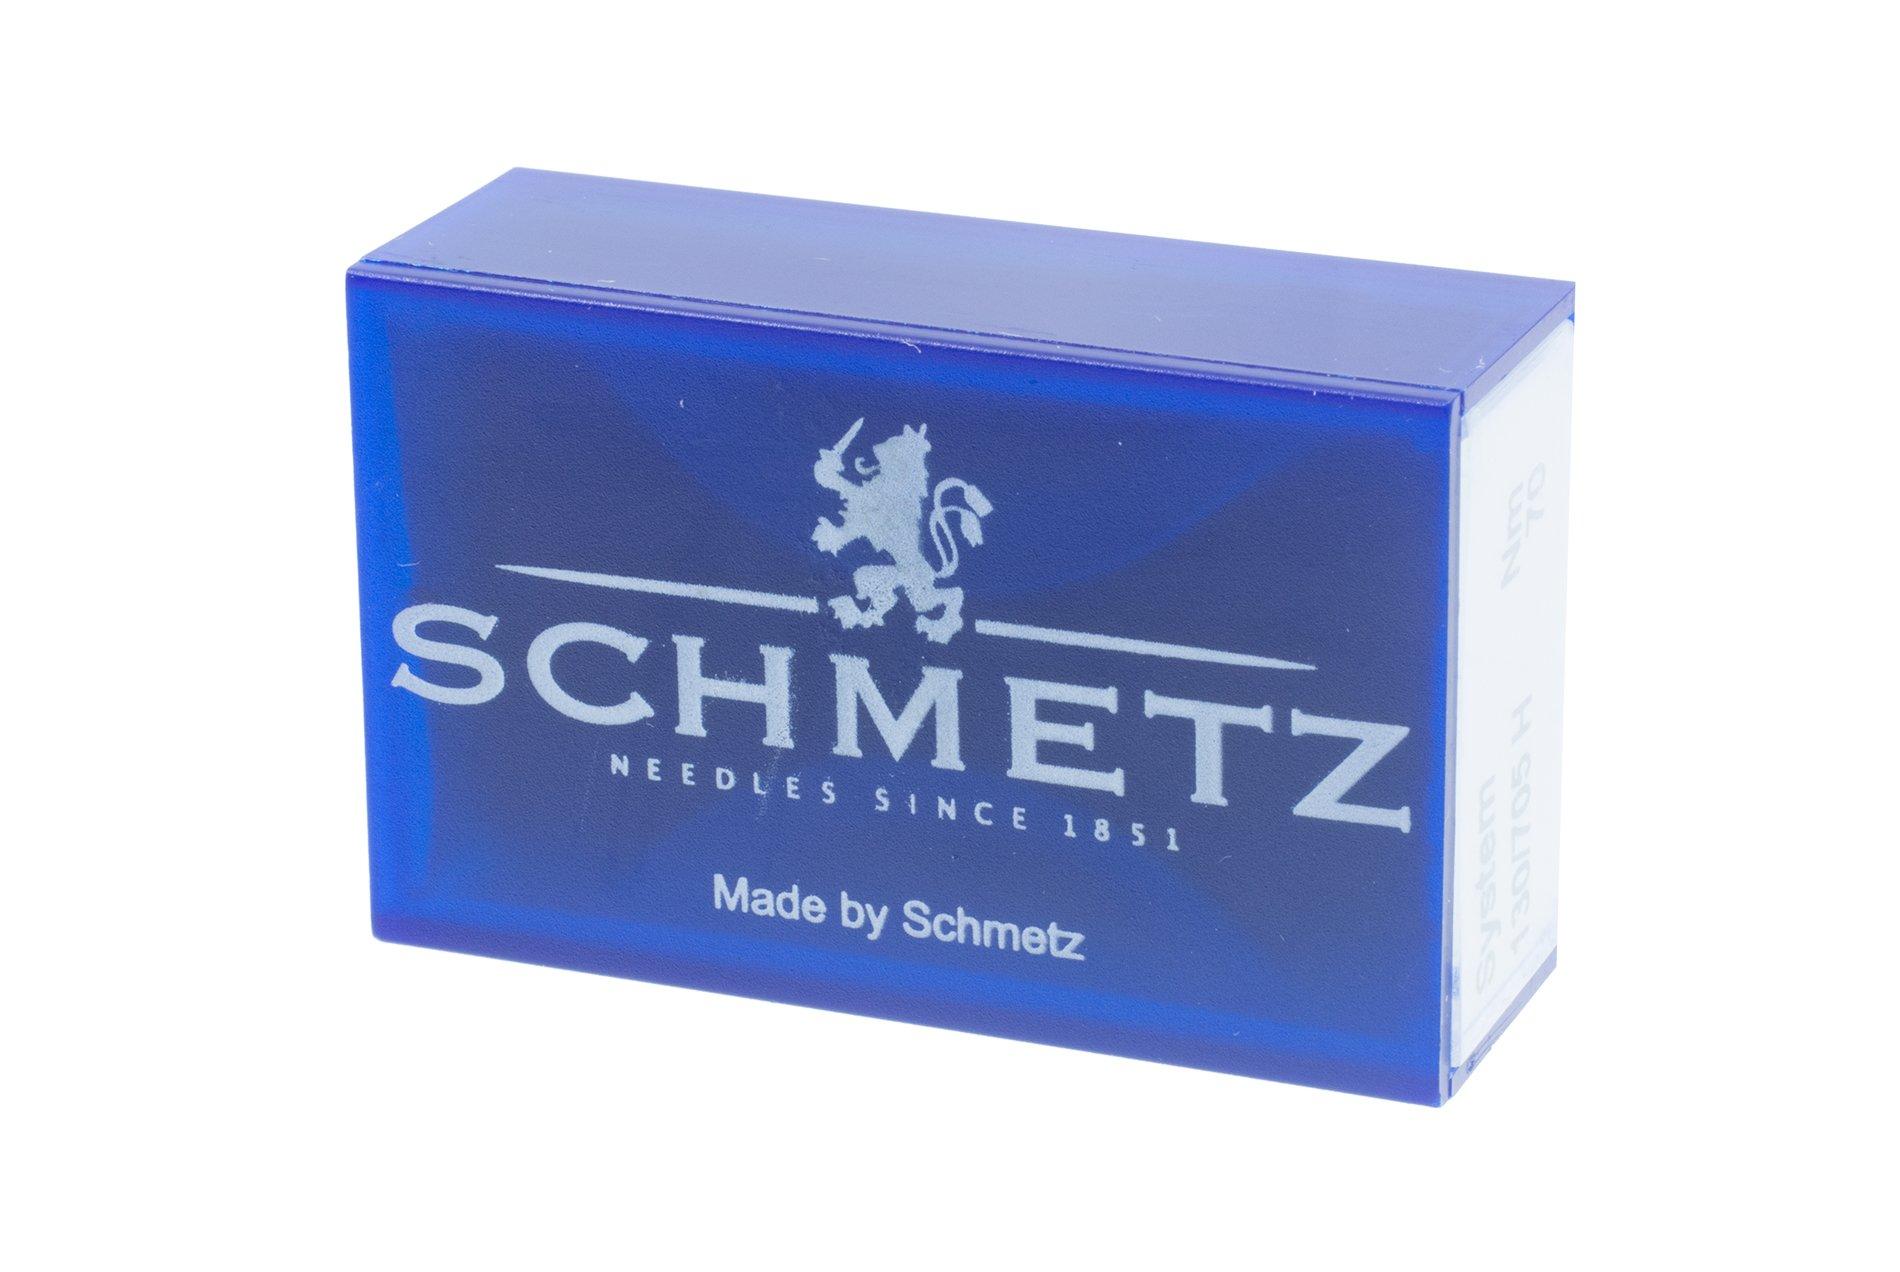 SCHMETZ Embroidery (130/705 H-E) Sewing Machine Needles - Bulk - Size 75/11 by Schmetz